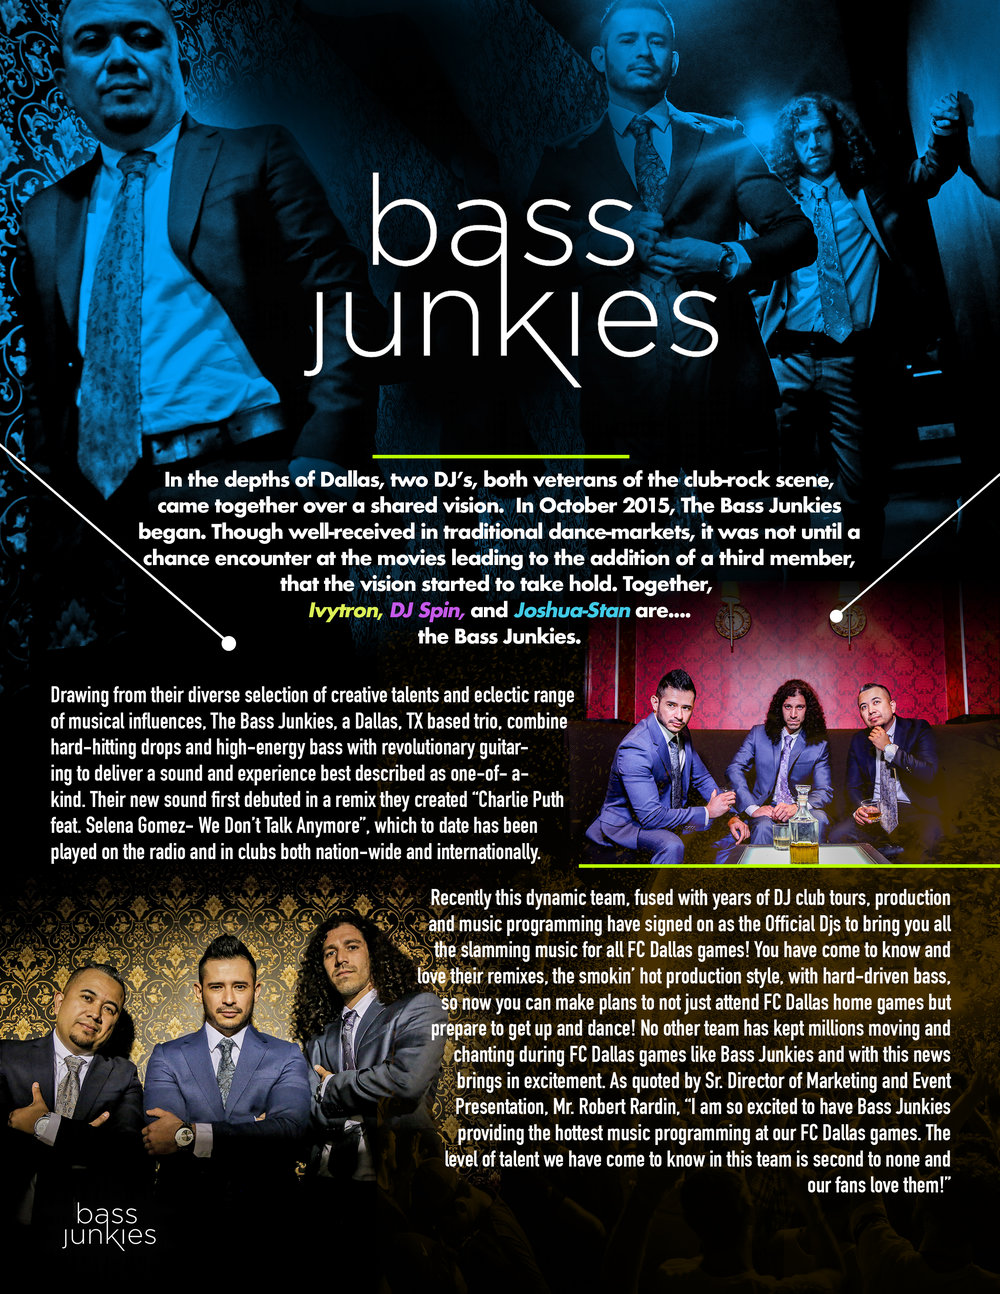 bass-junkies-epk-pg1-2.jpg